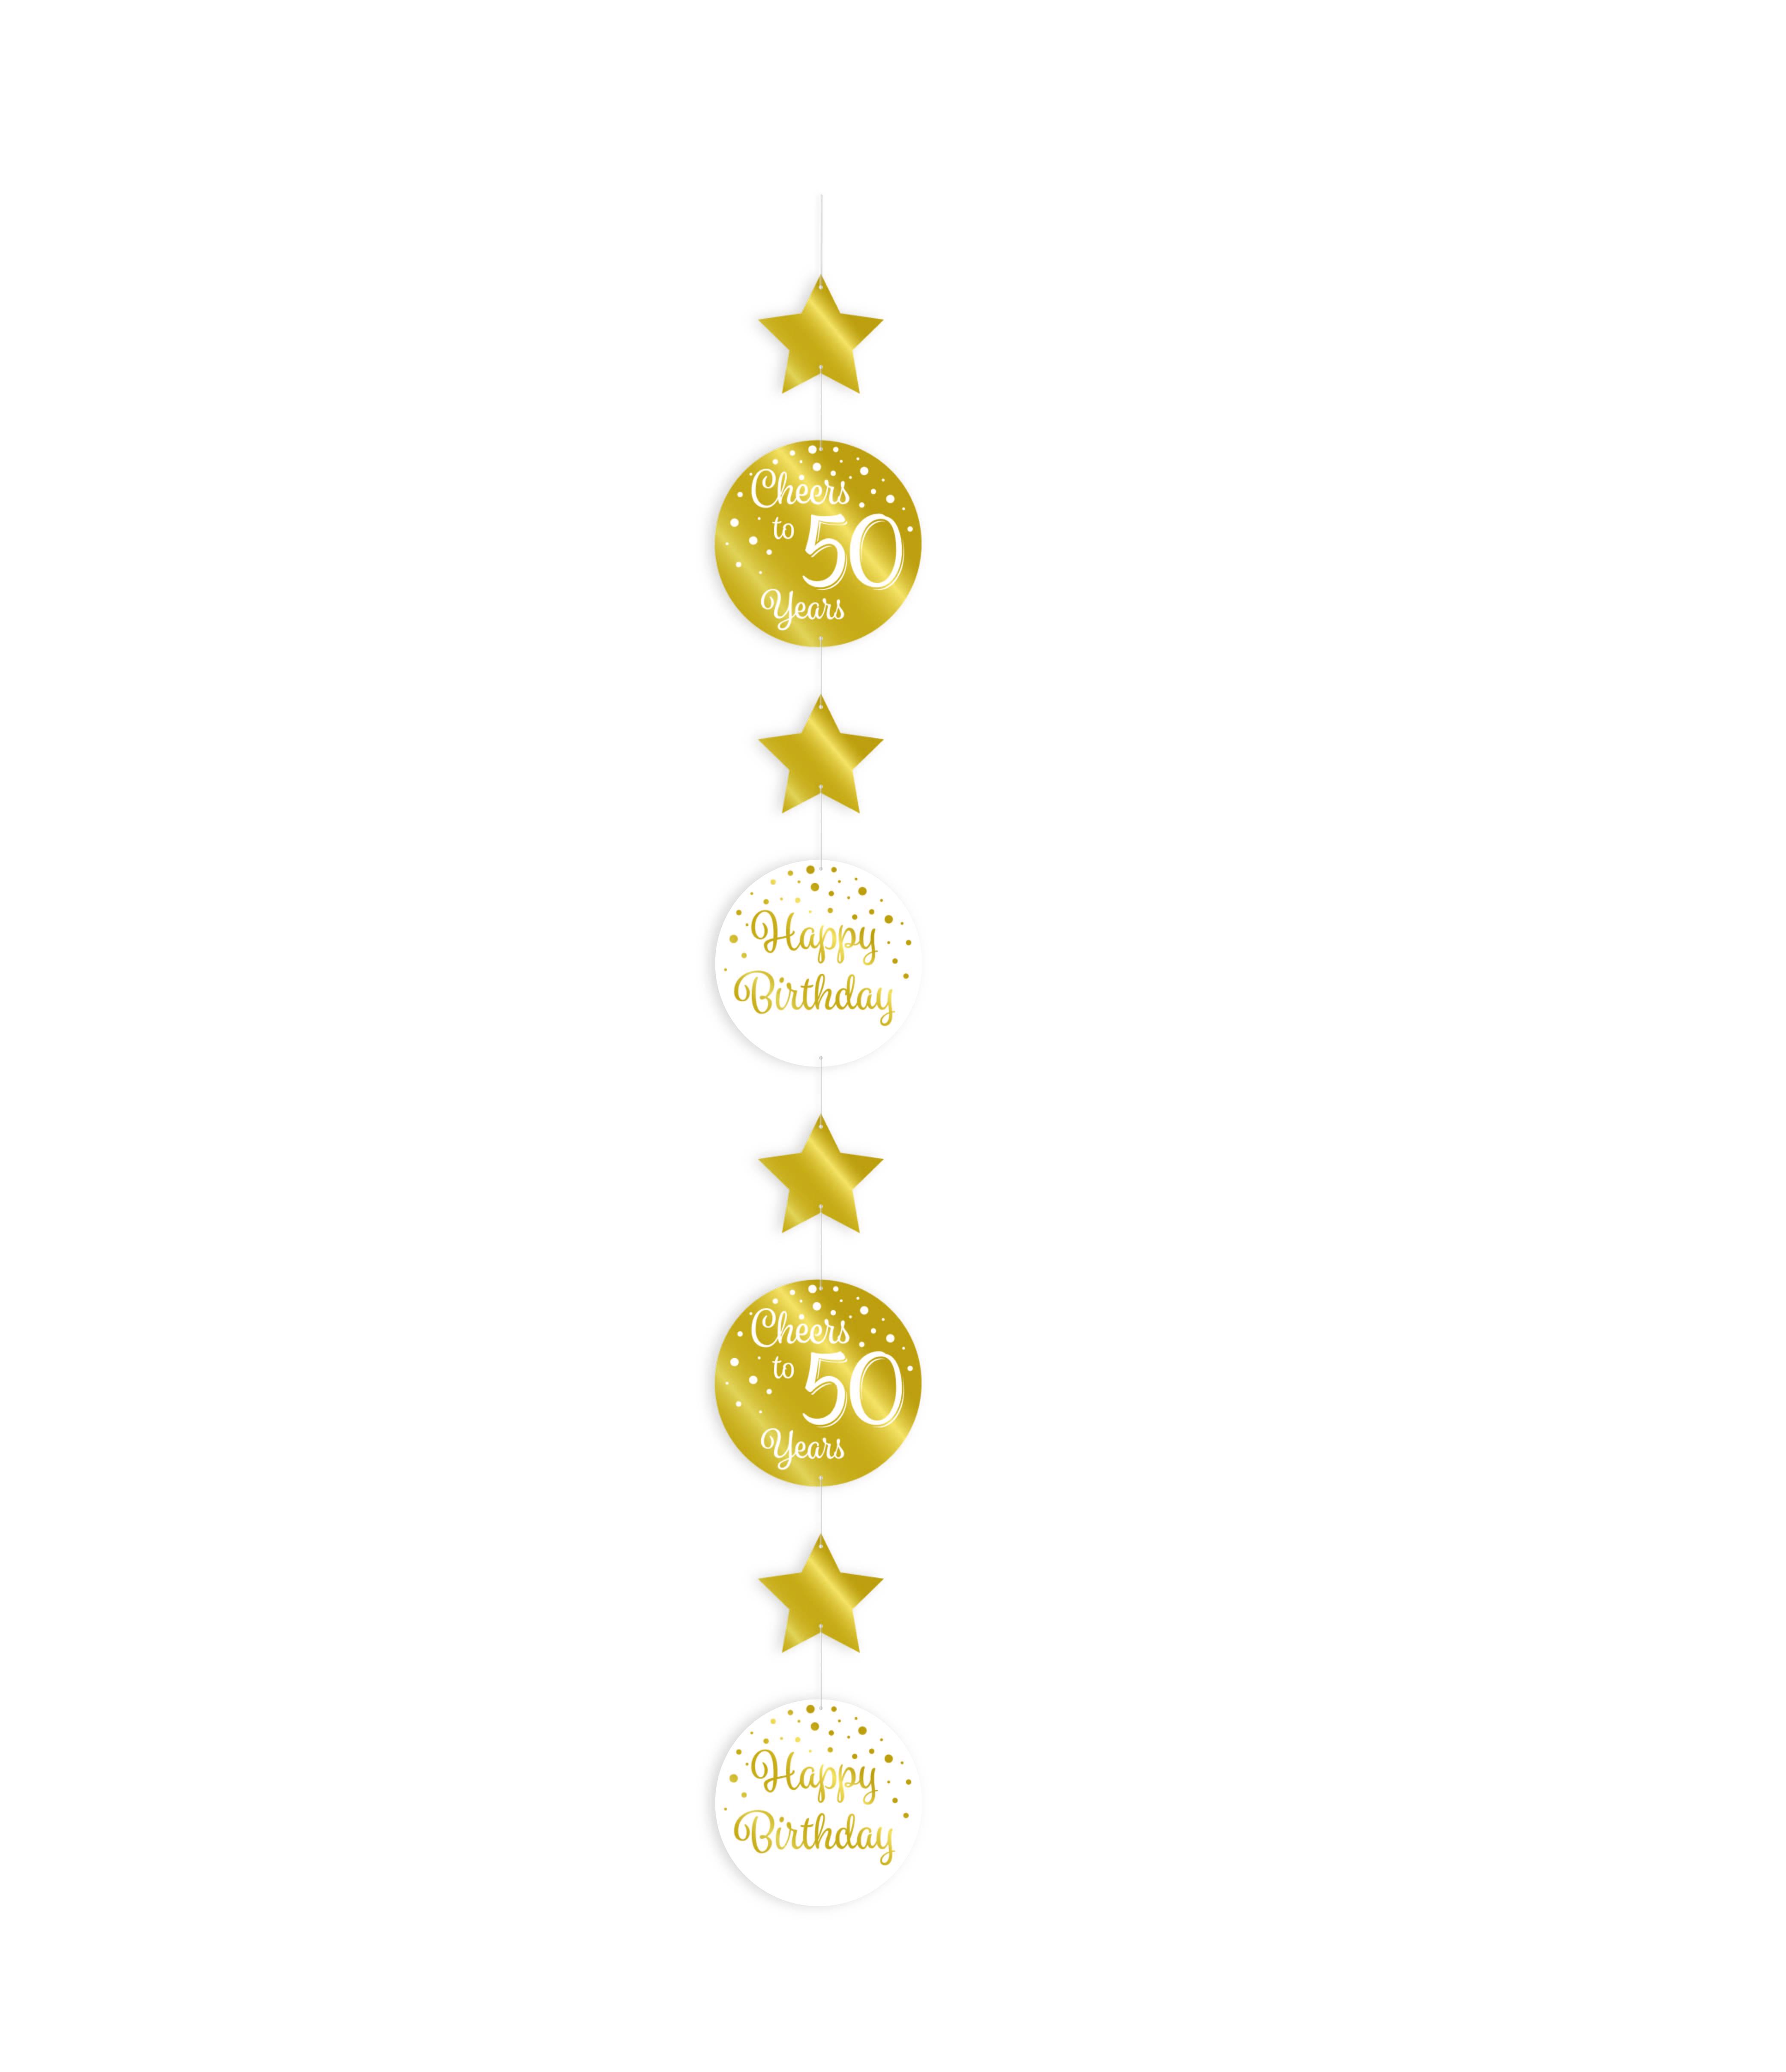 Hangdecoratie Goud/Wit Cheers to 50 Years